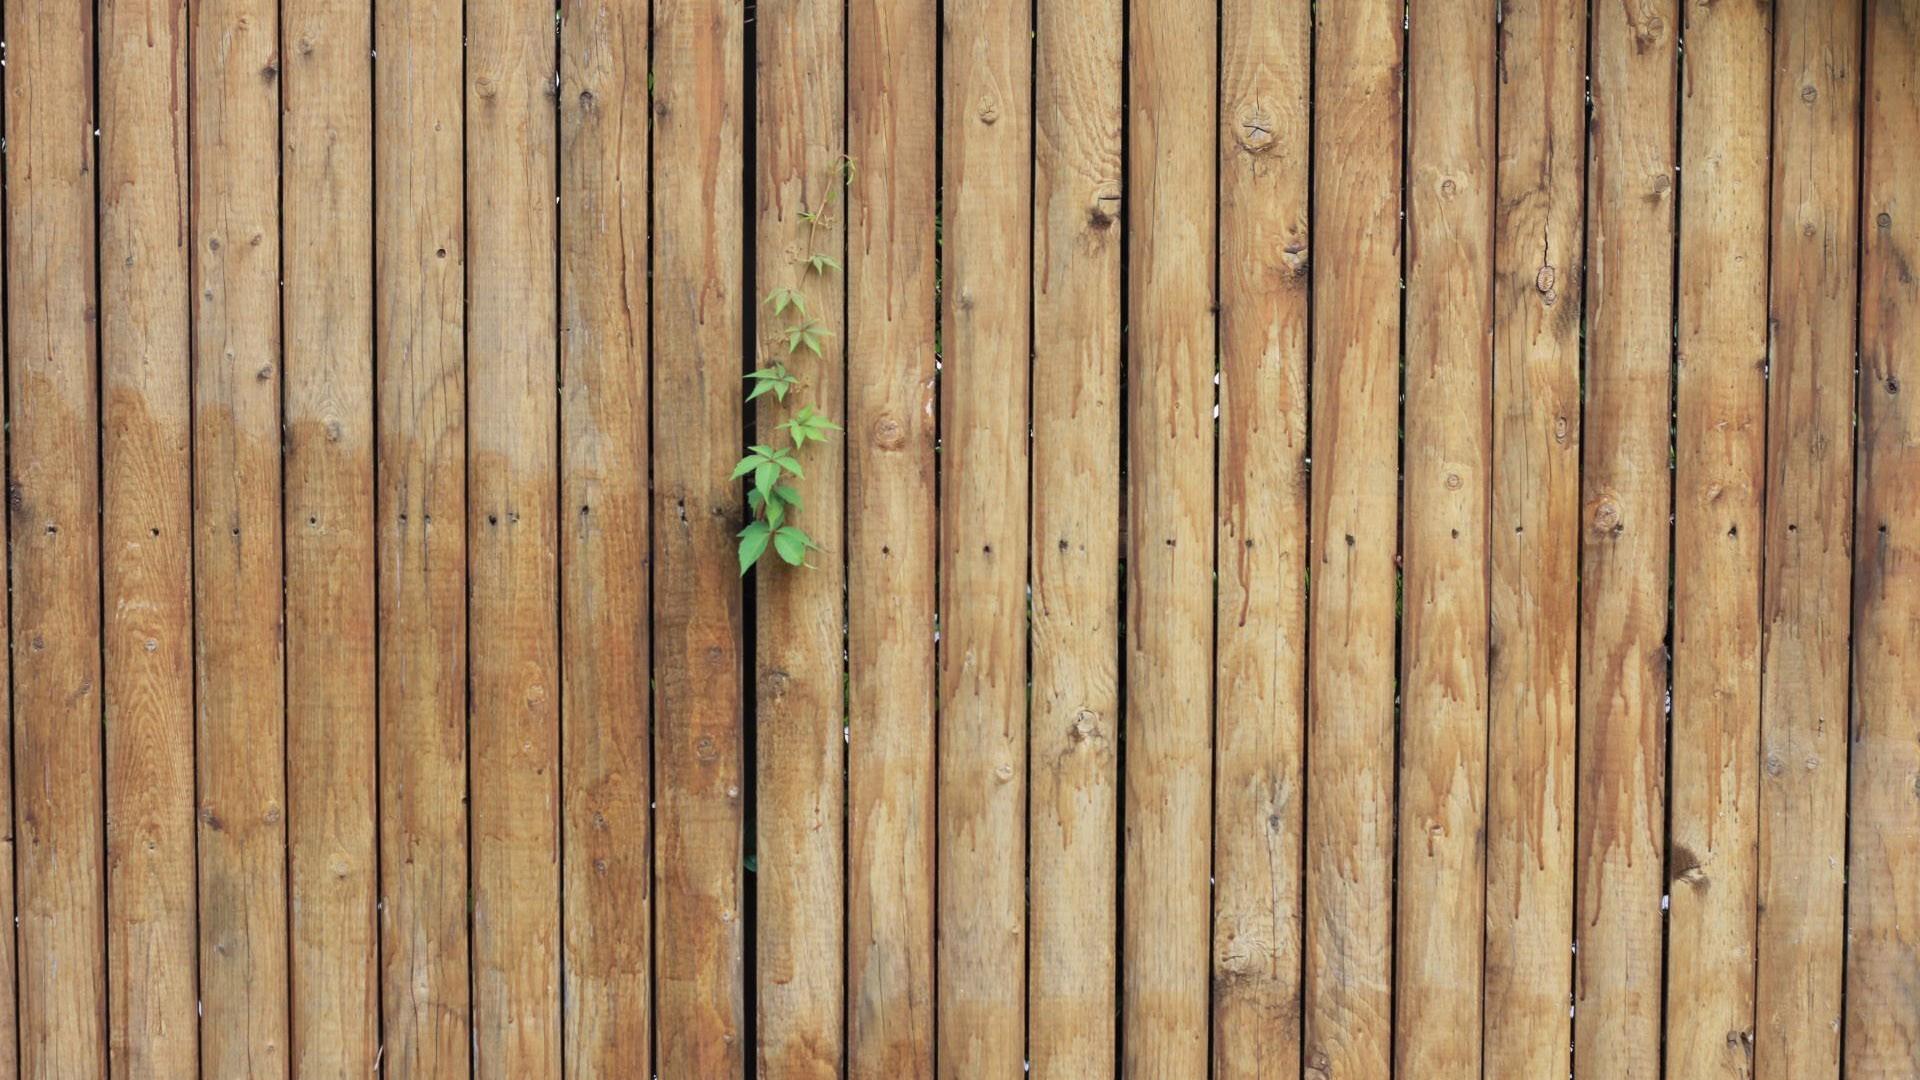 Fondos de pantalla hojas superficie de madera textura - Transferir fotos a madera ...